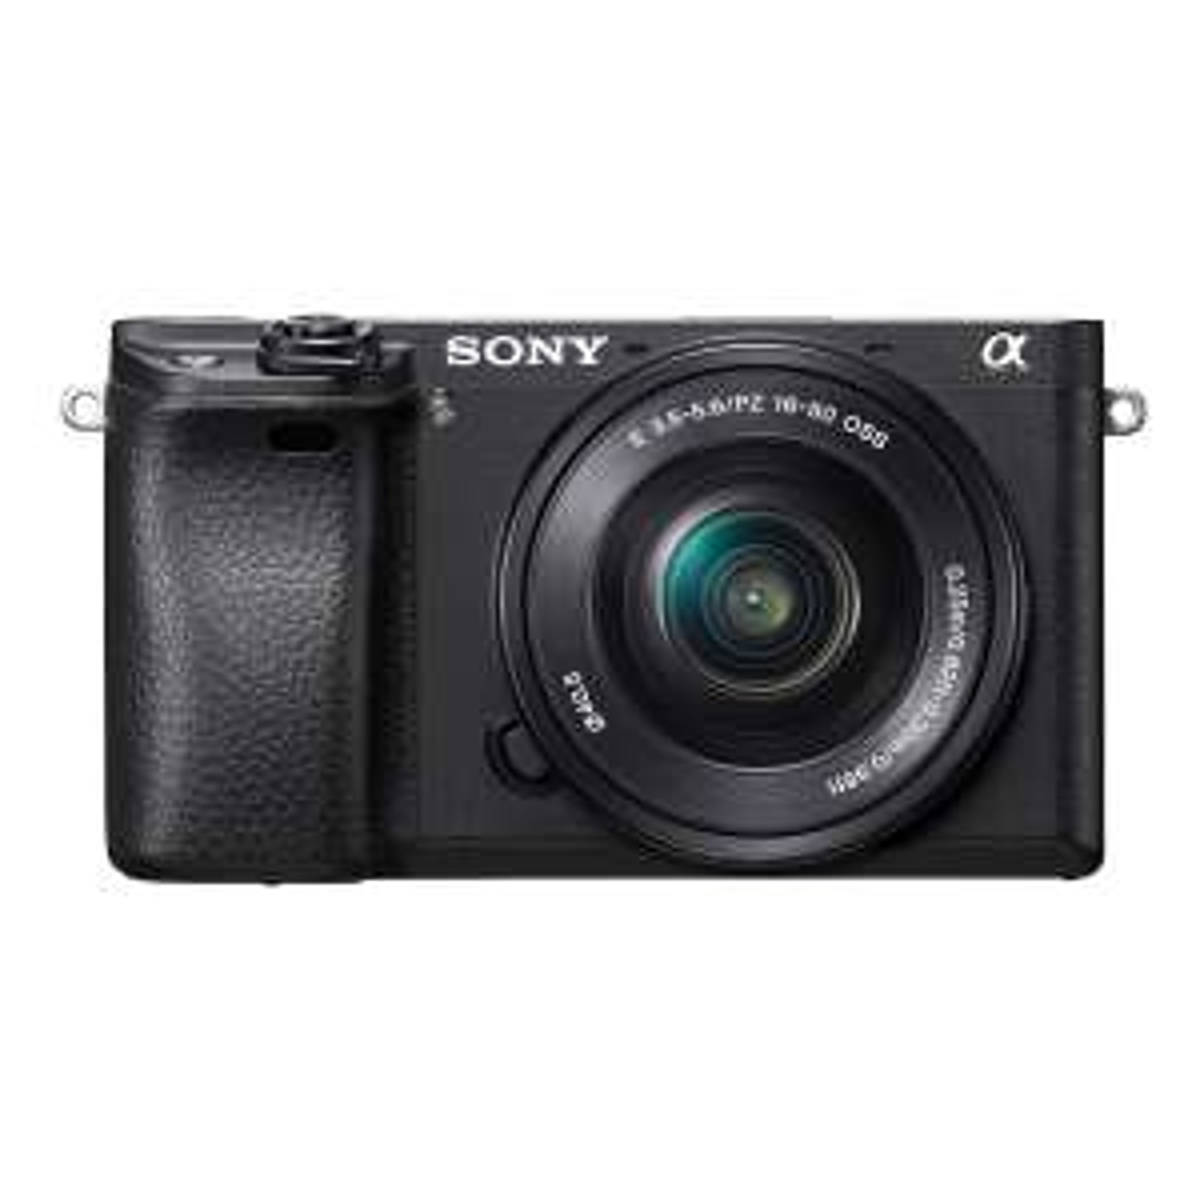 Sony Alpha 6300 E-mount Cameras/Body BIONZ x 24.2 Megapixel Exmor-CMOS APS-C CMOS Sensor, Quick Hybrid 425 Stage